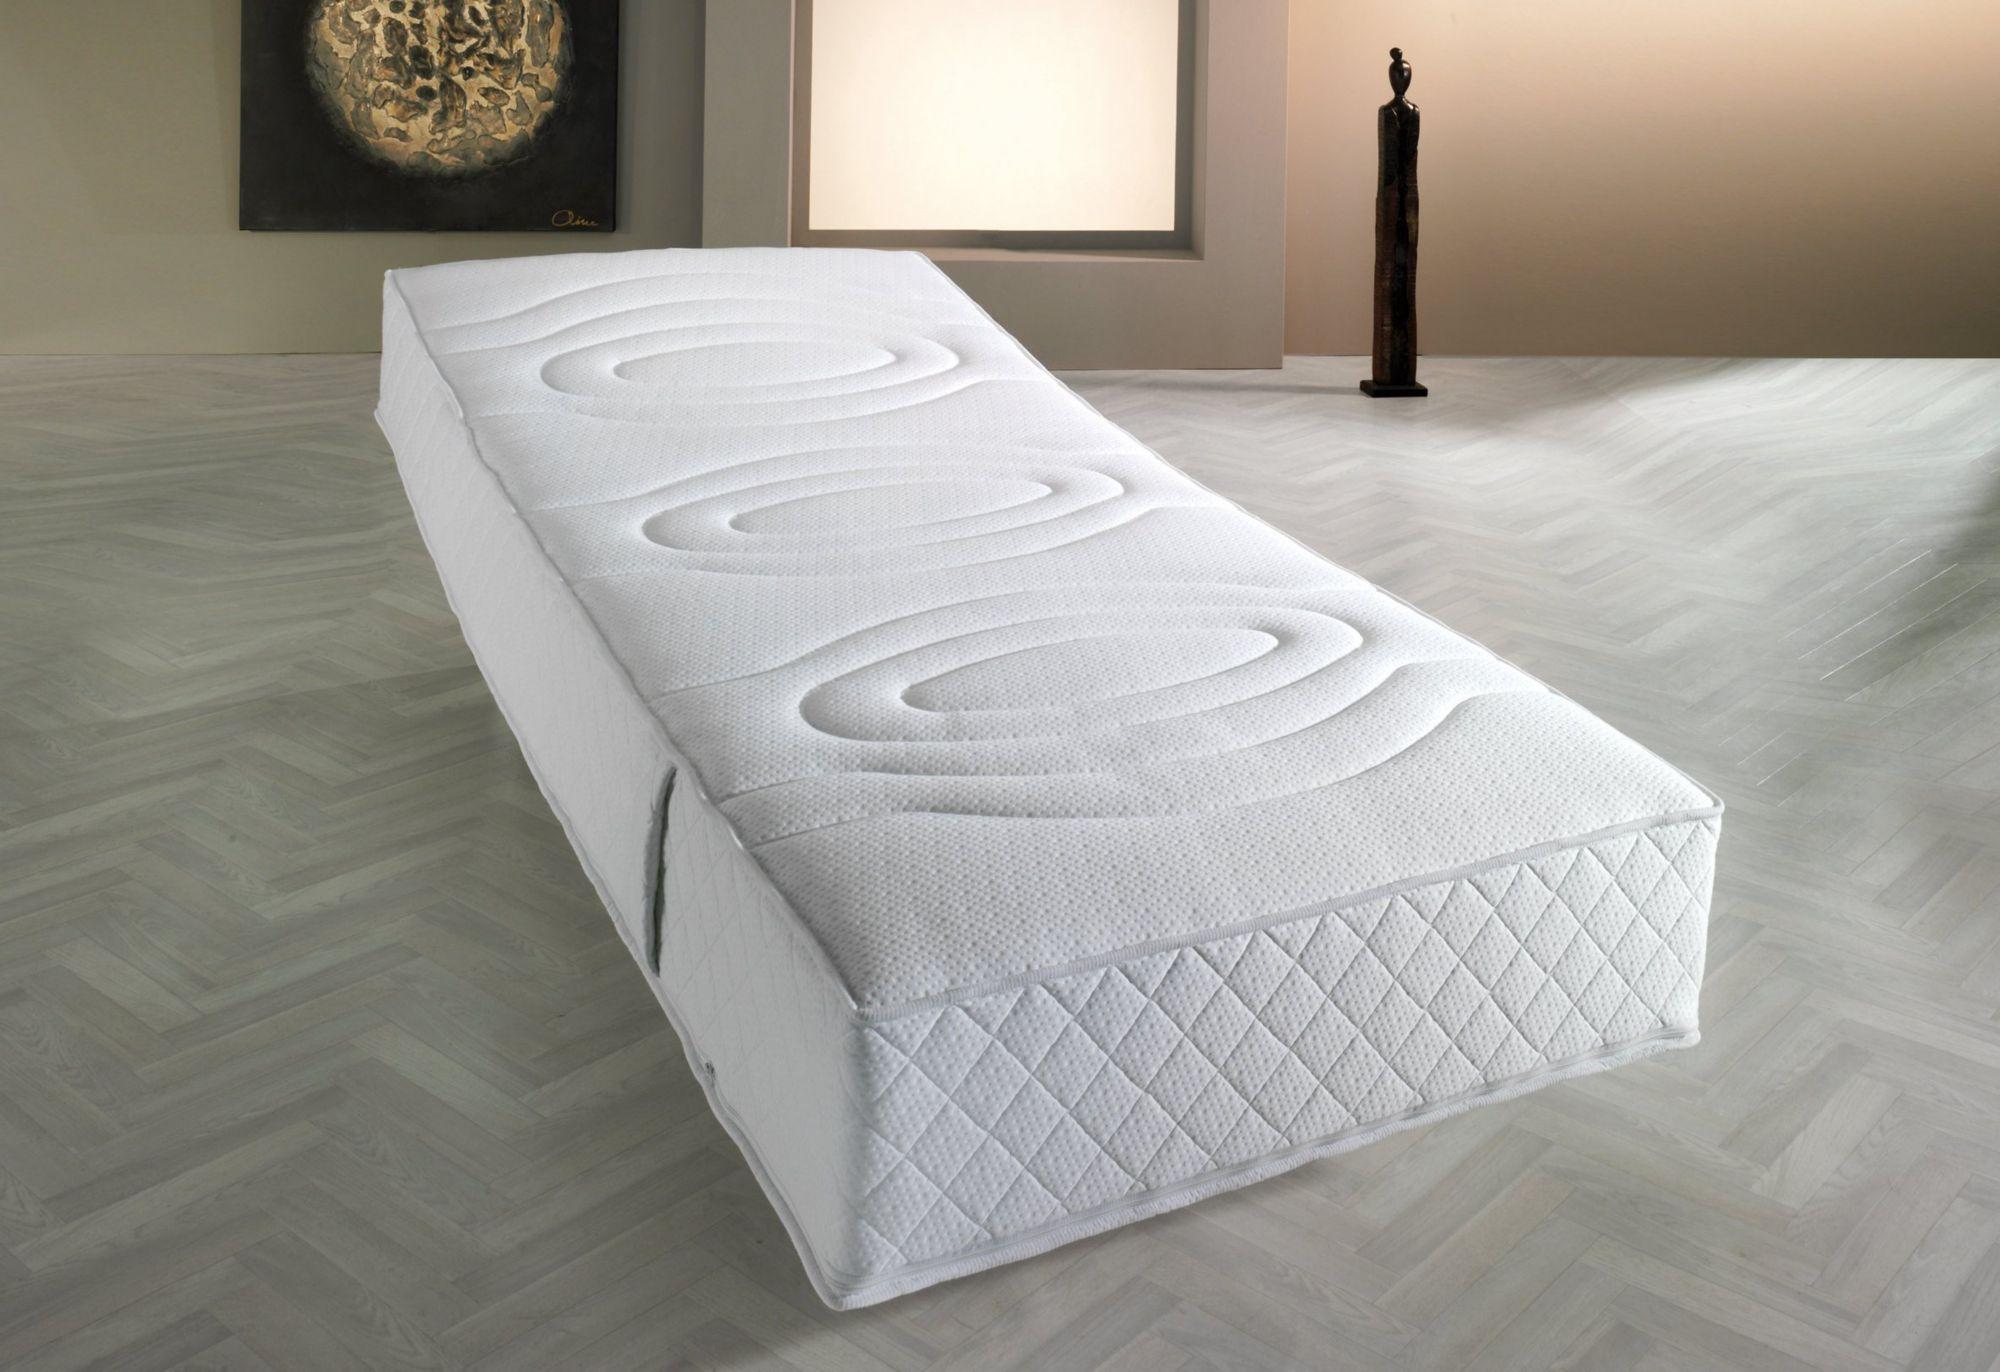 FAN FRANKENSTOLZ Taschenfederkernmatratze, »Komfort 1.000 T«, f.a.n. Frankenstolz, 26 cm hoch, 900 Federn